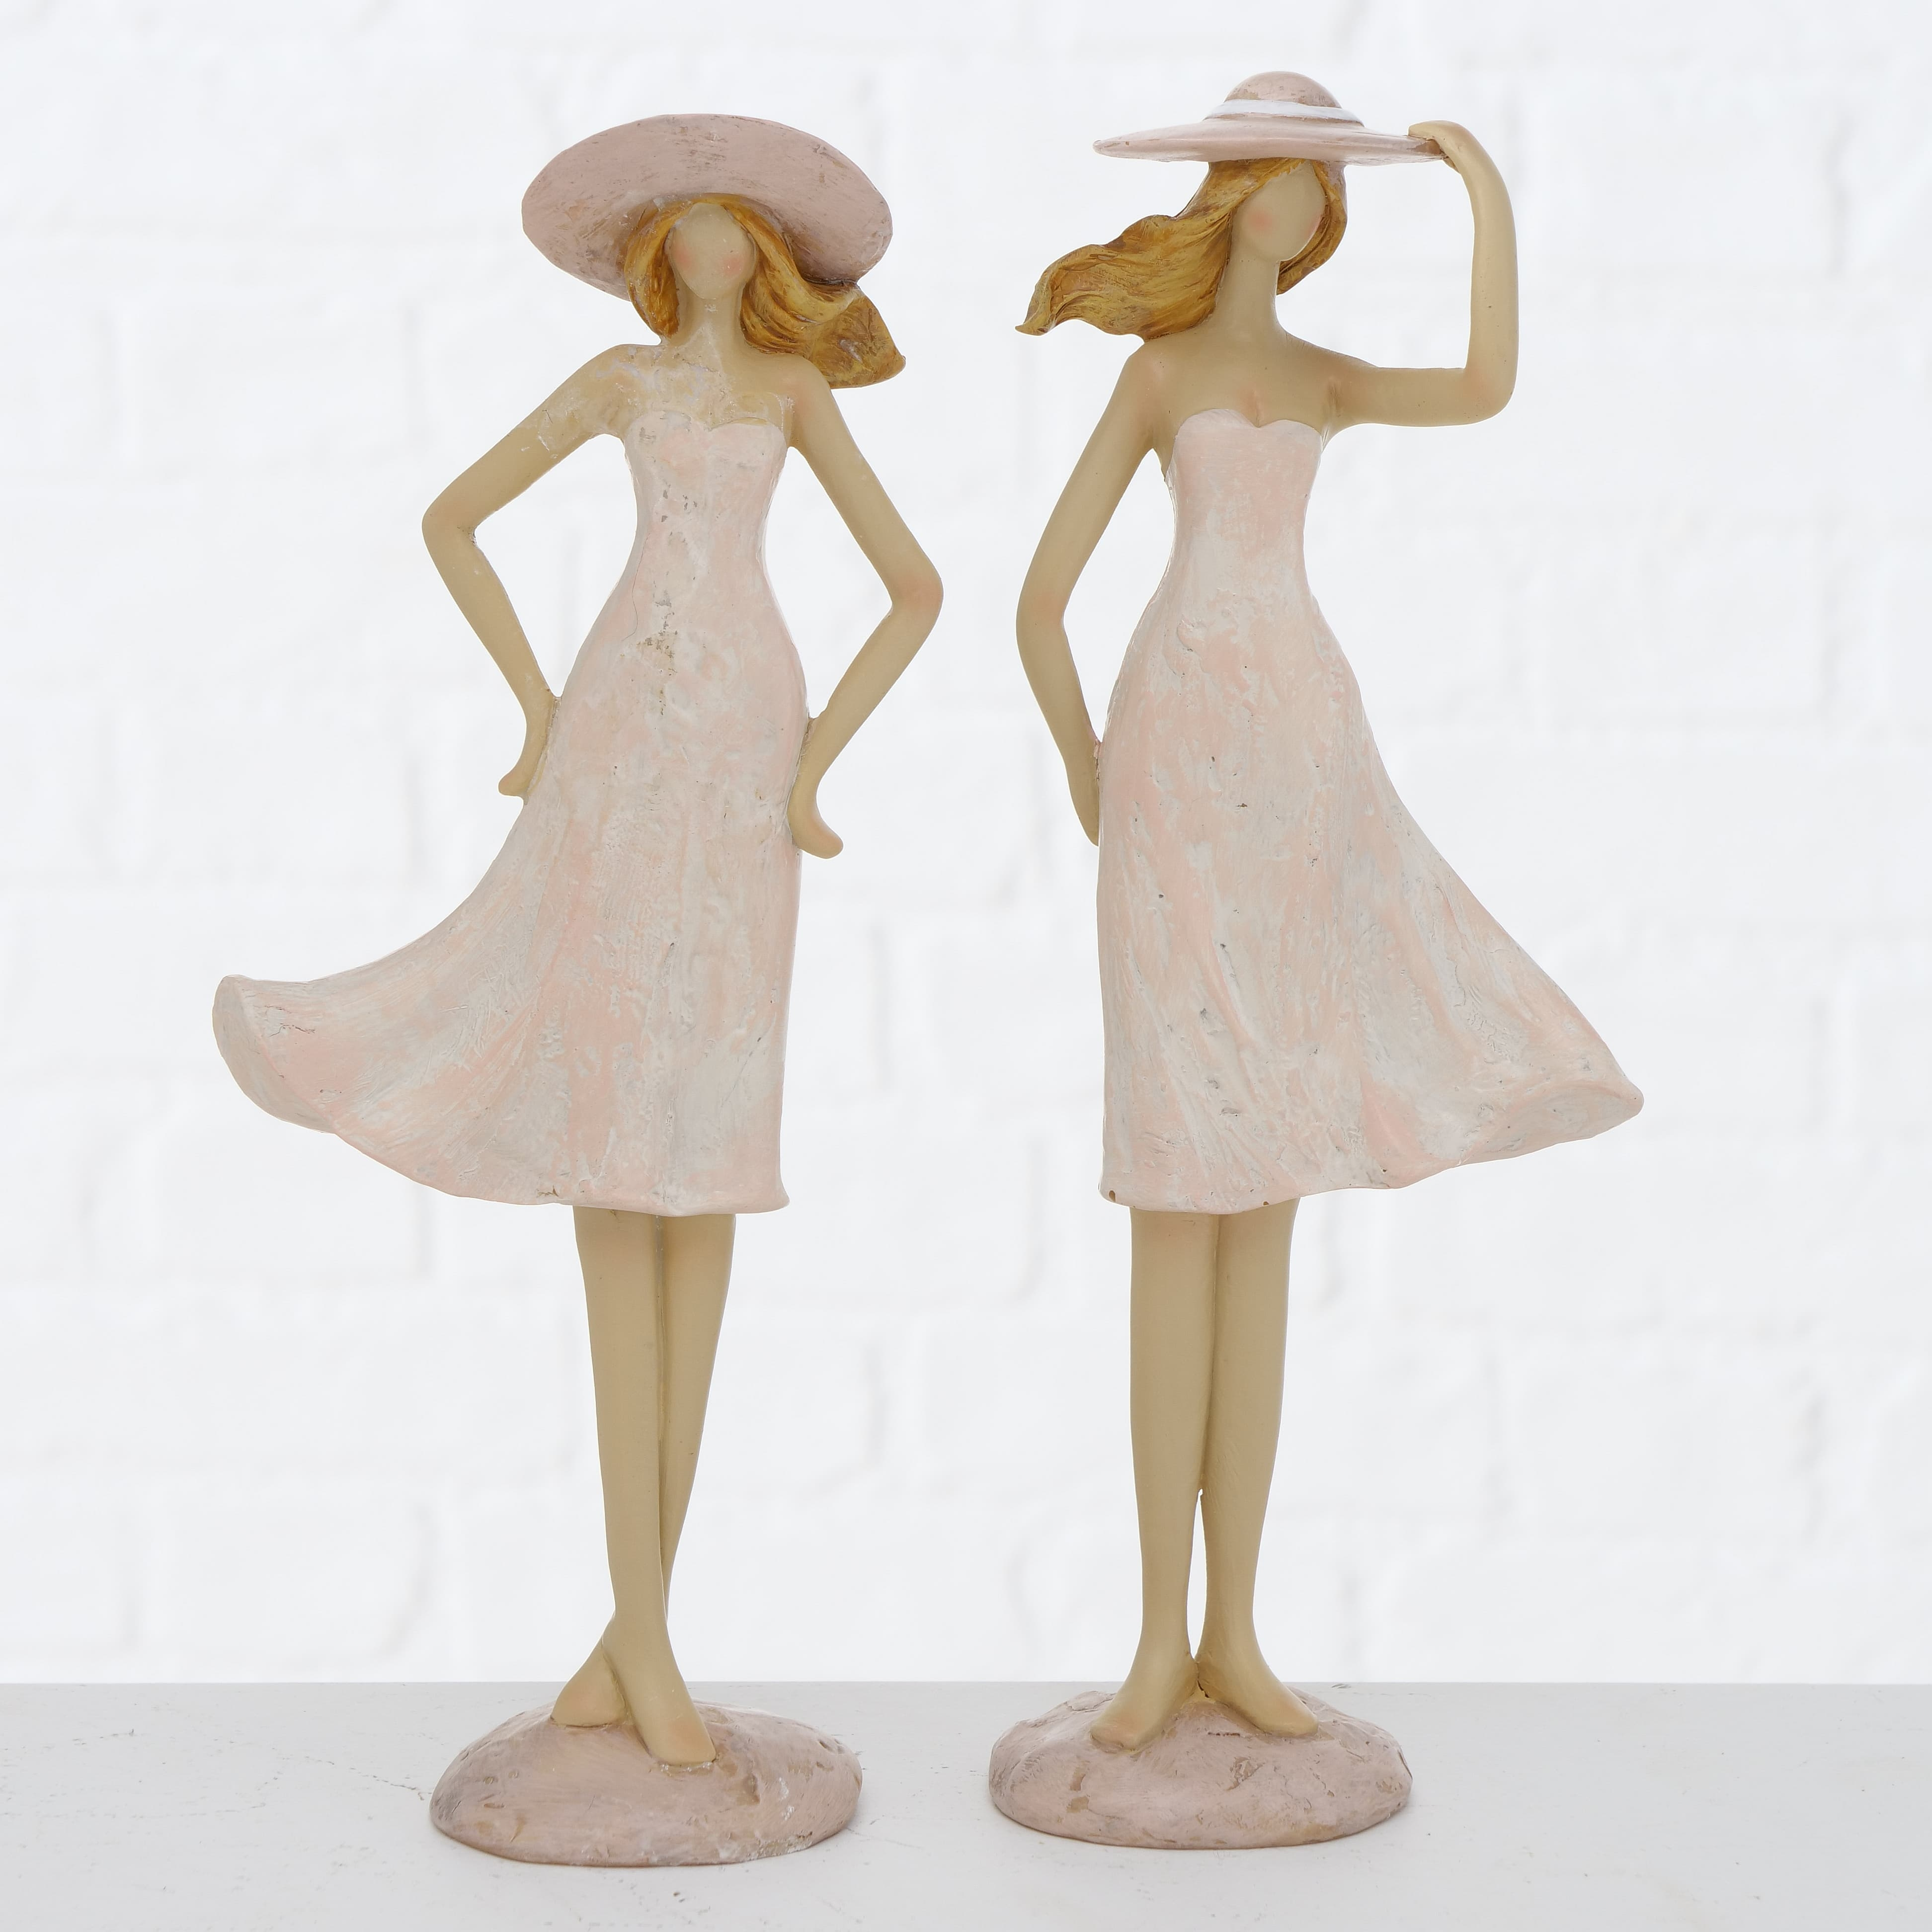 Decoratiune din polirasina Mikela Roz deschis, Modele Asortate, l10xA5xH25 cm